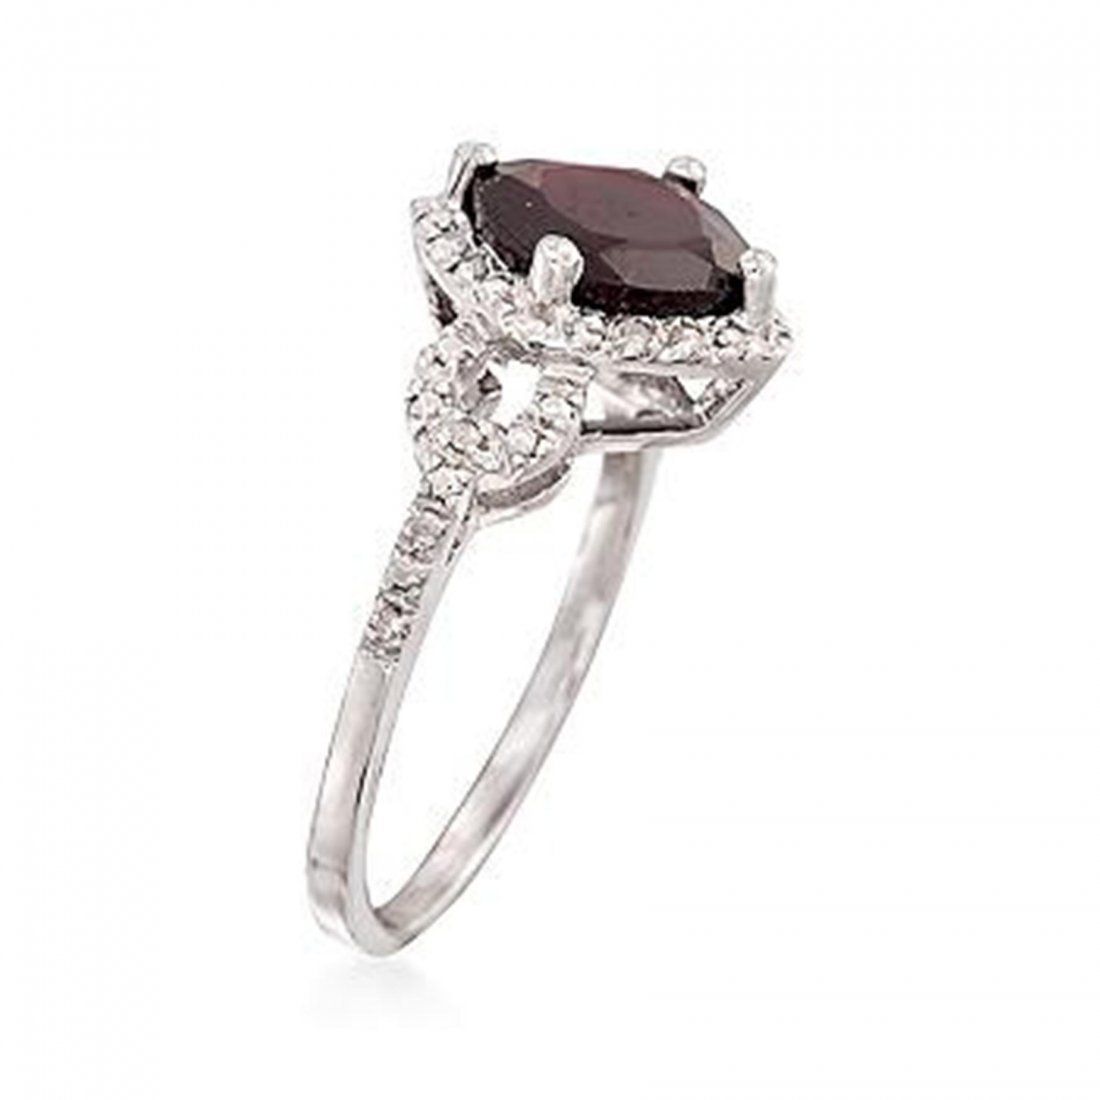 2.70 Carat Garnet and Diamond Ring in Sterling Sir